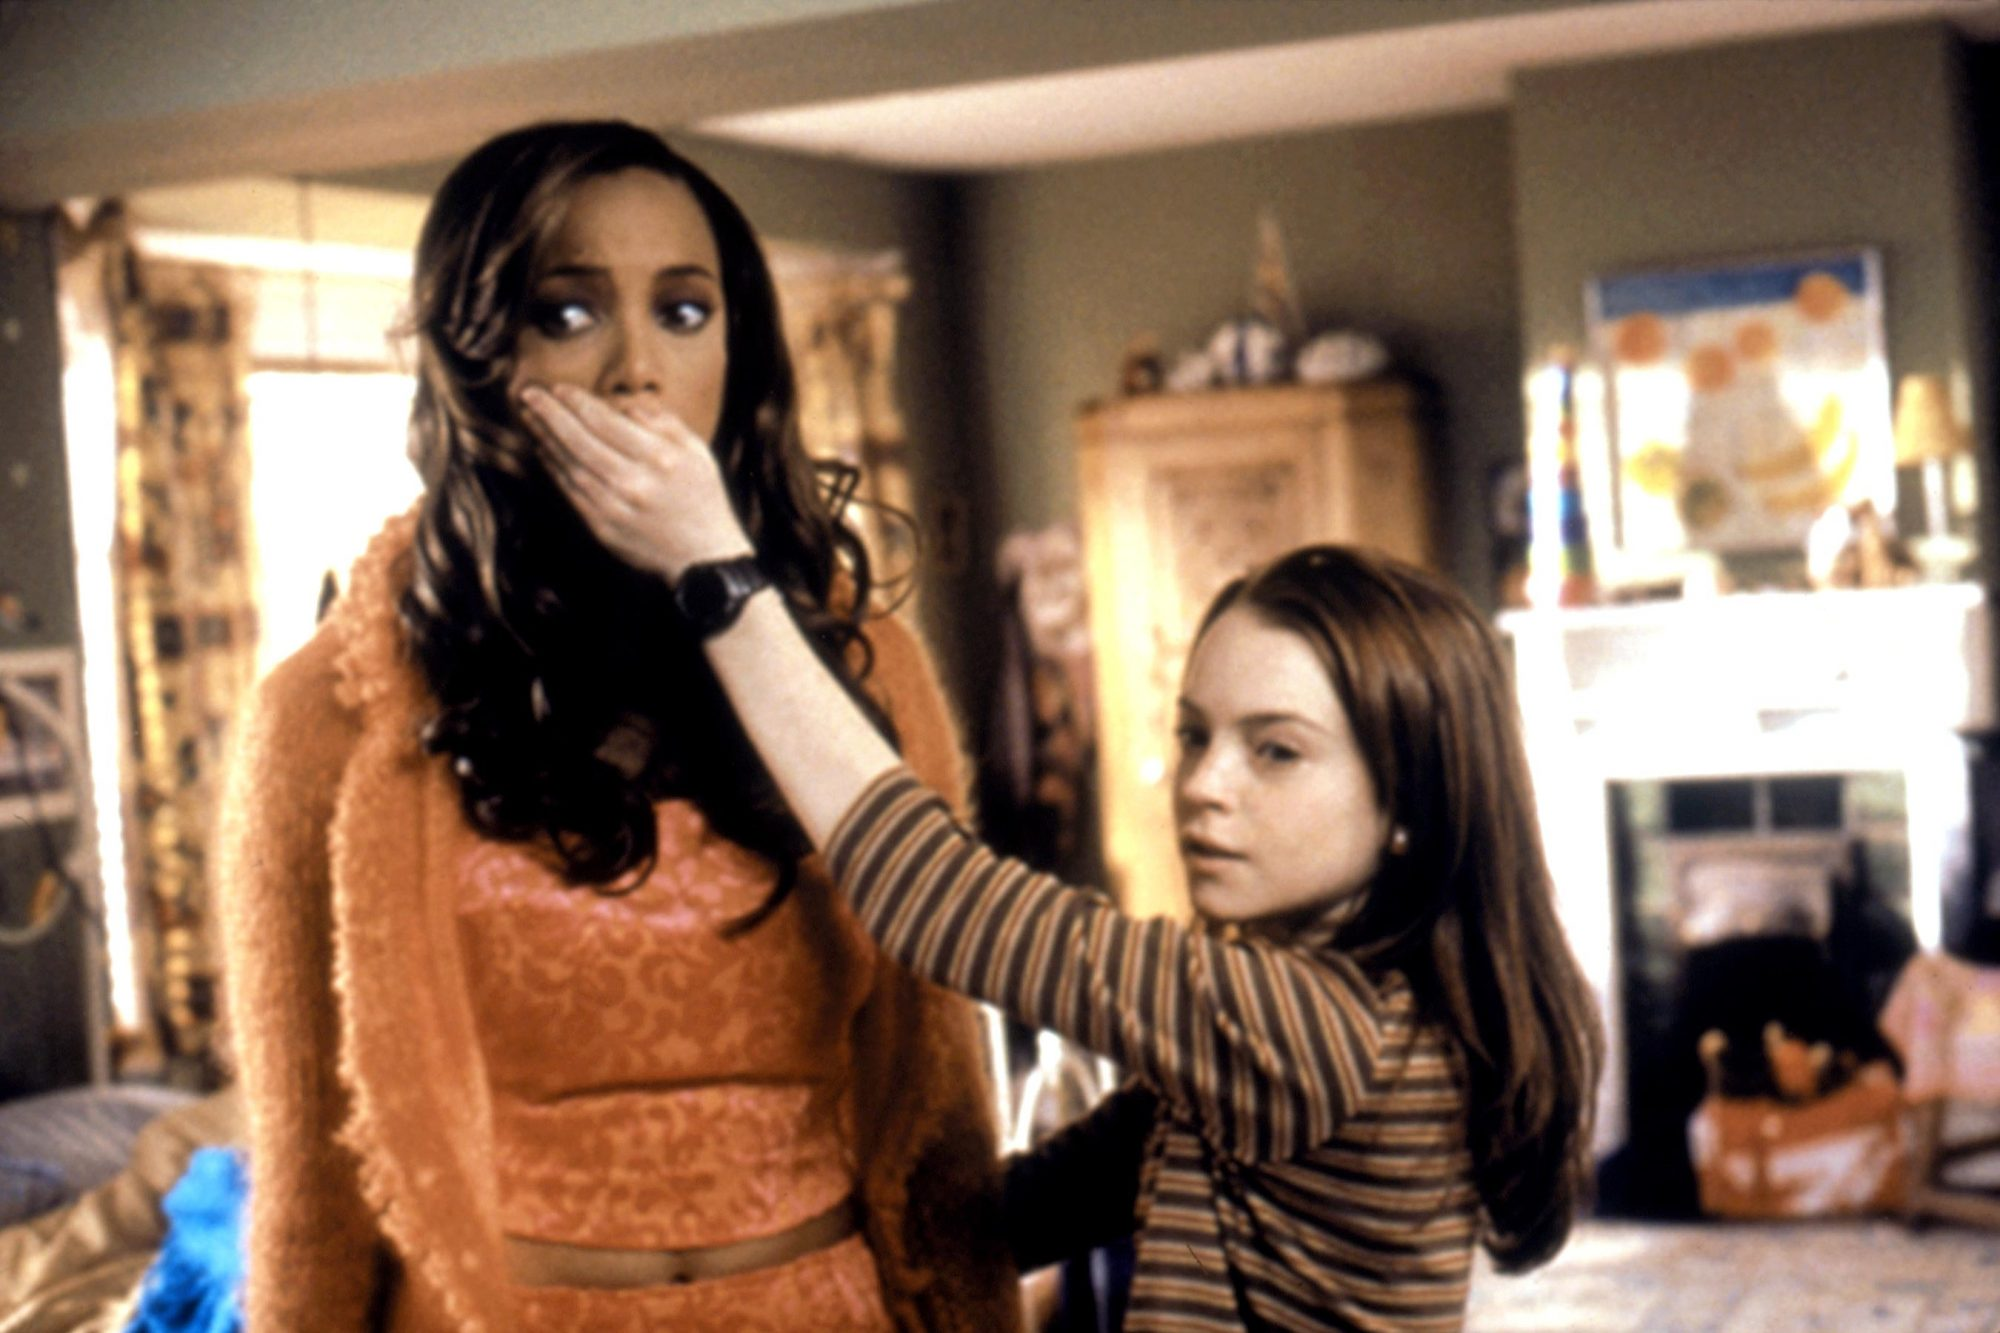 LIFE-SIZE, Tyra Banks, Lindsay Lohan, 2000, © Walt Disney Co. / Courtesy: Everett Collection